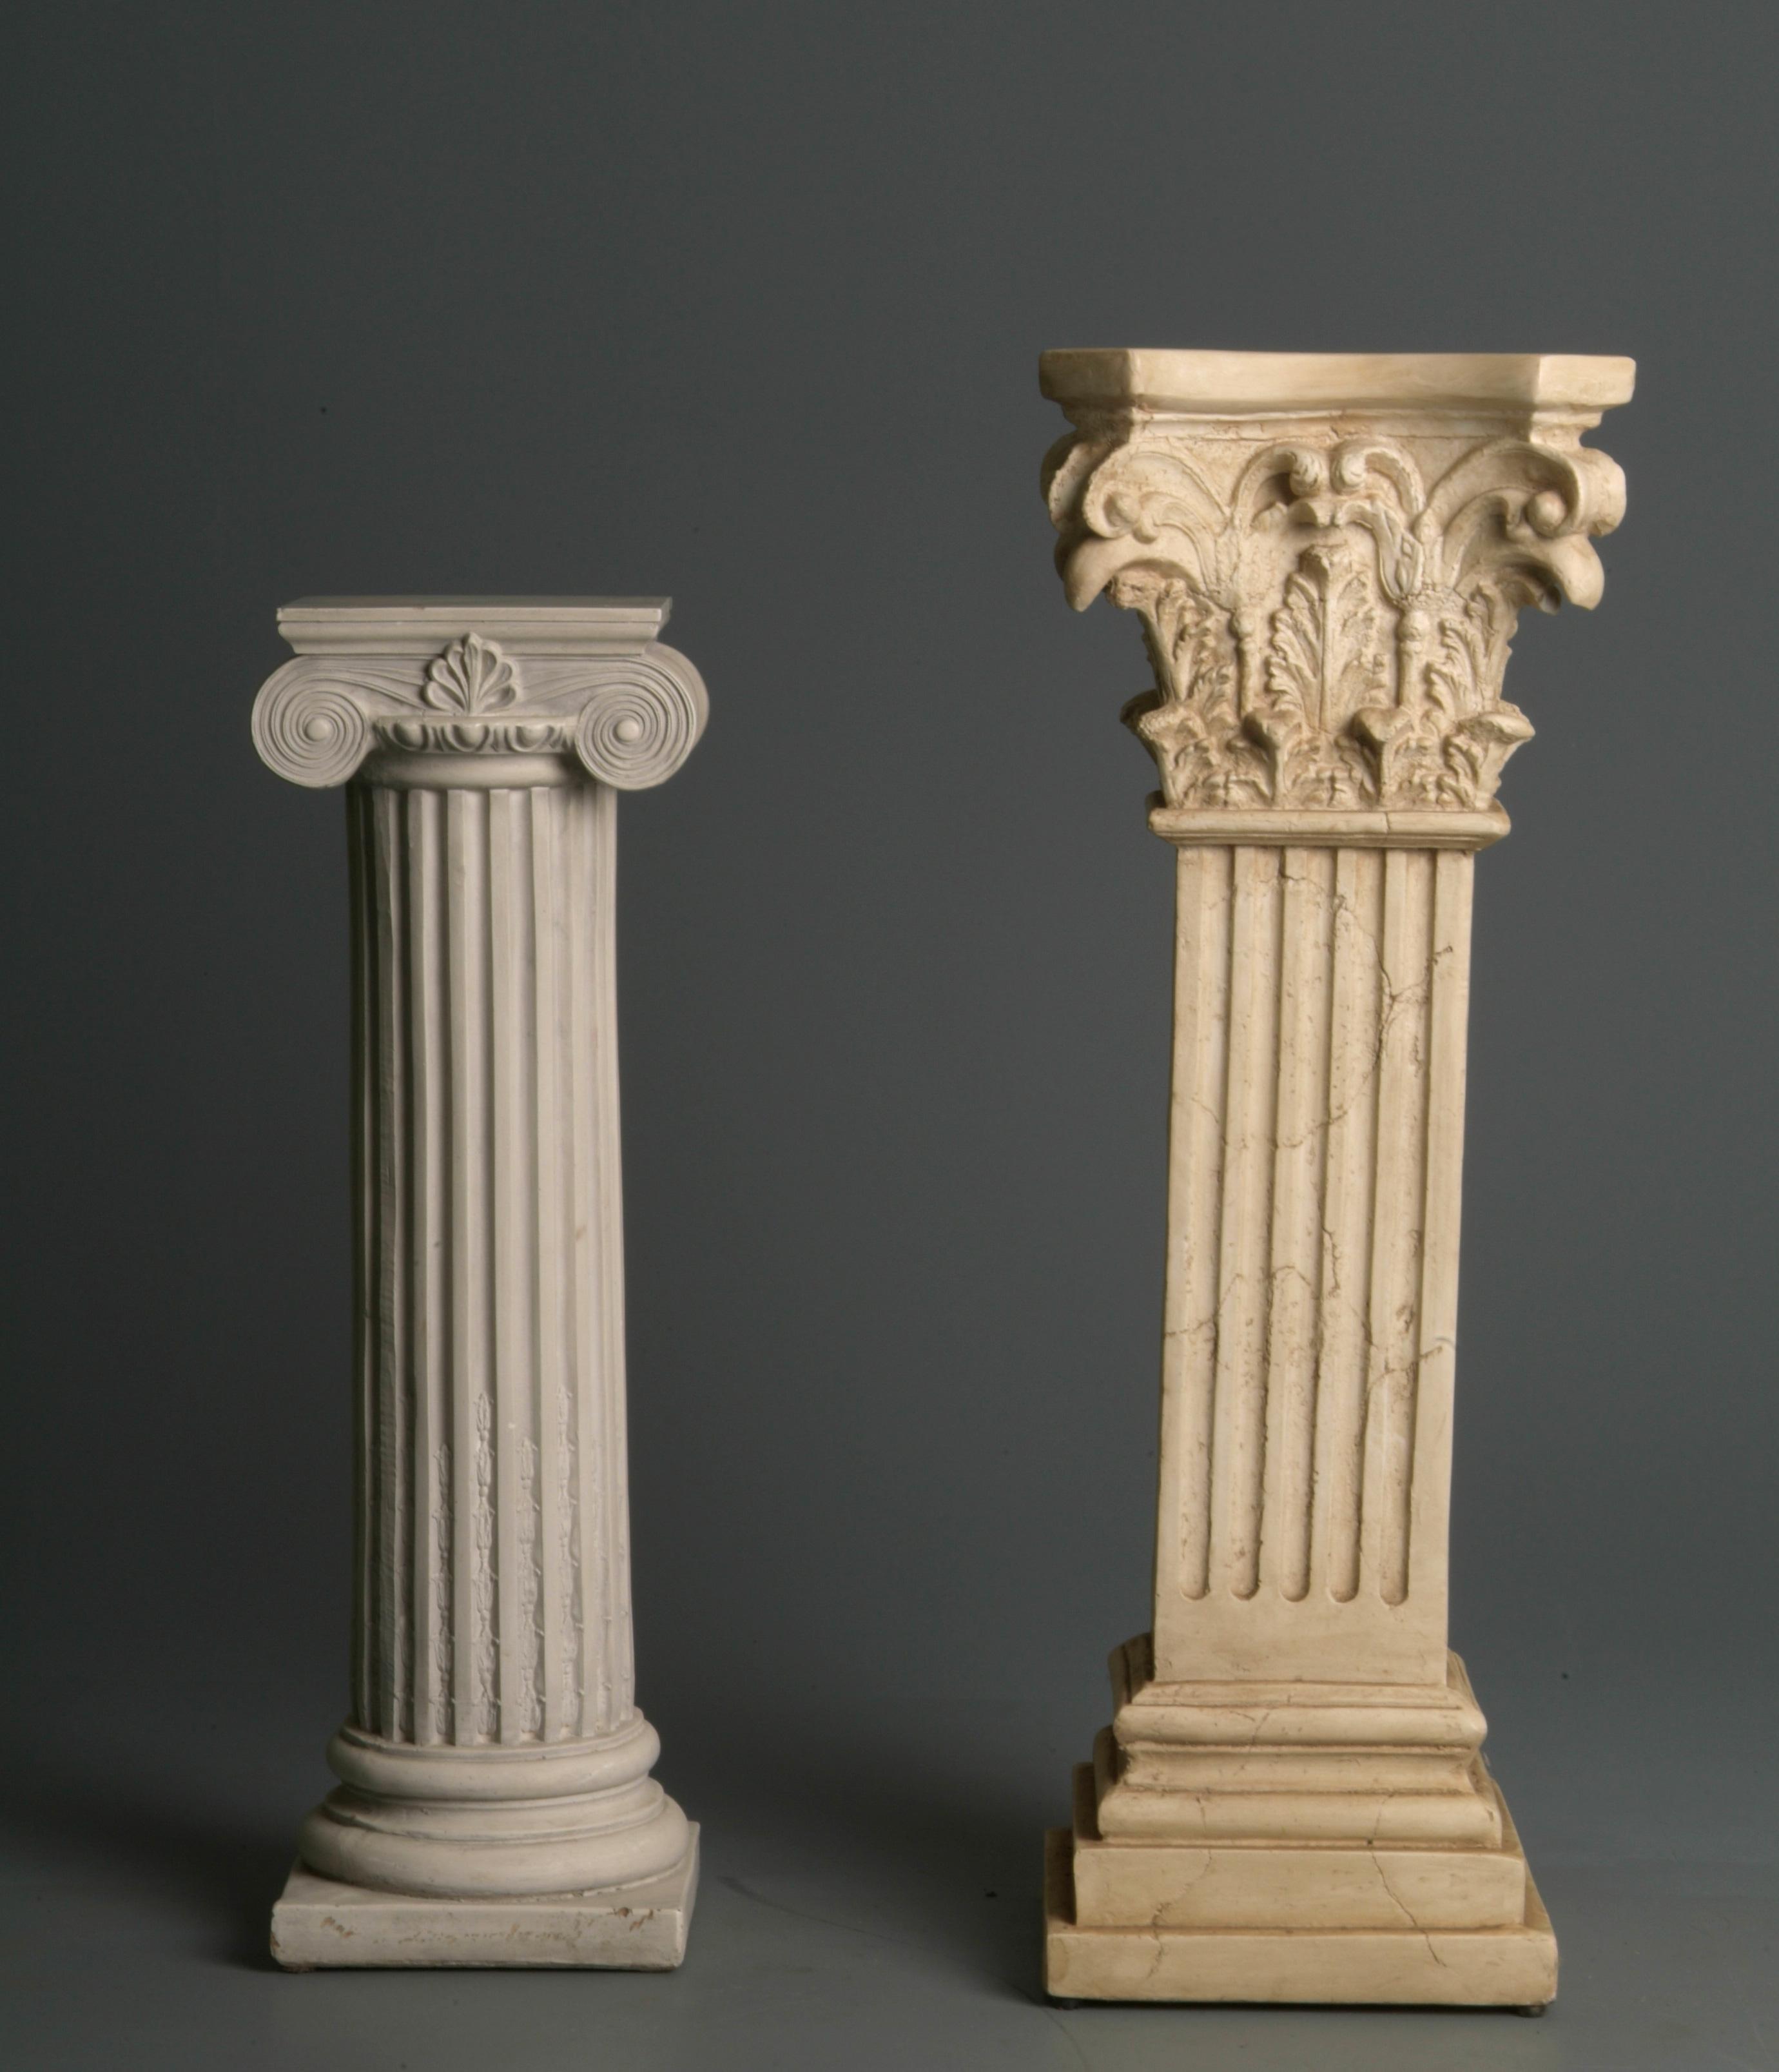 pedestals by mjranum-stock